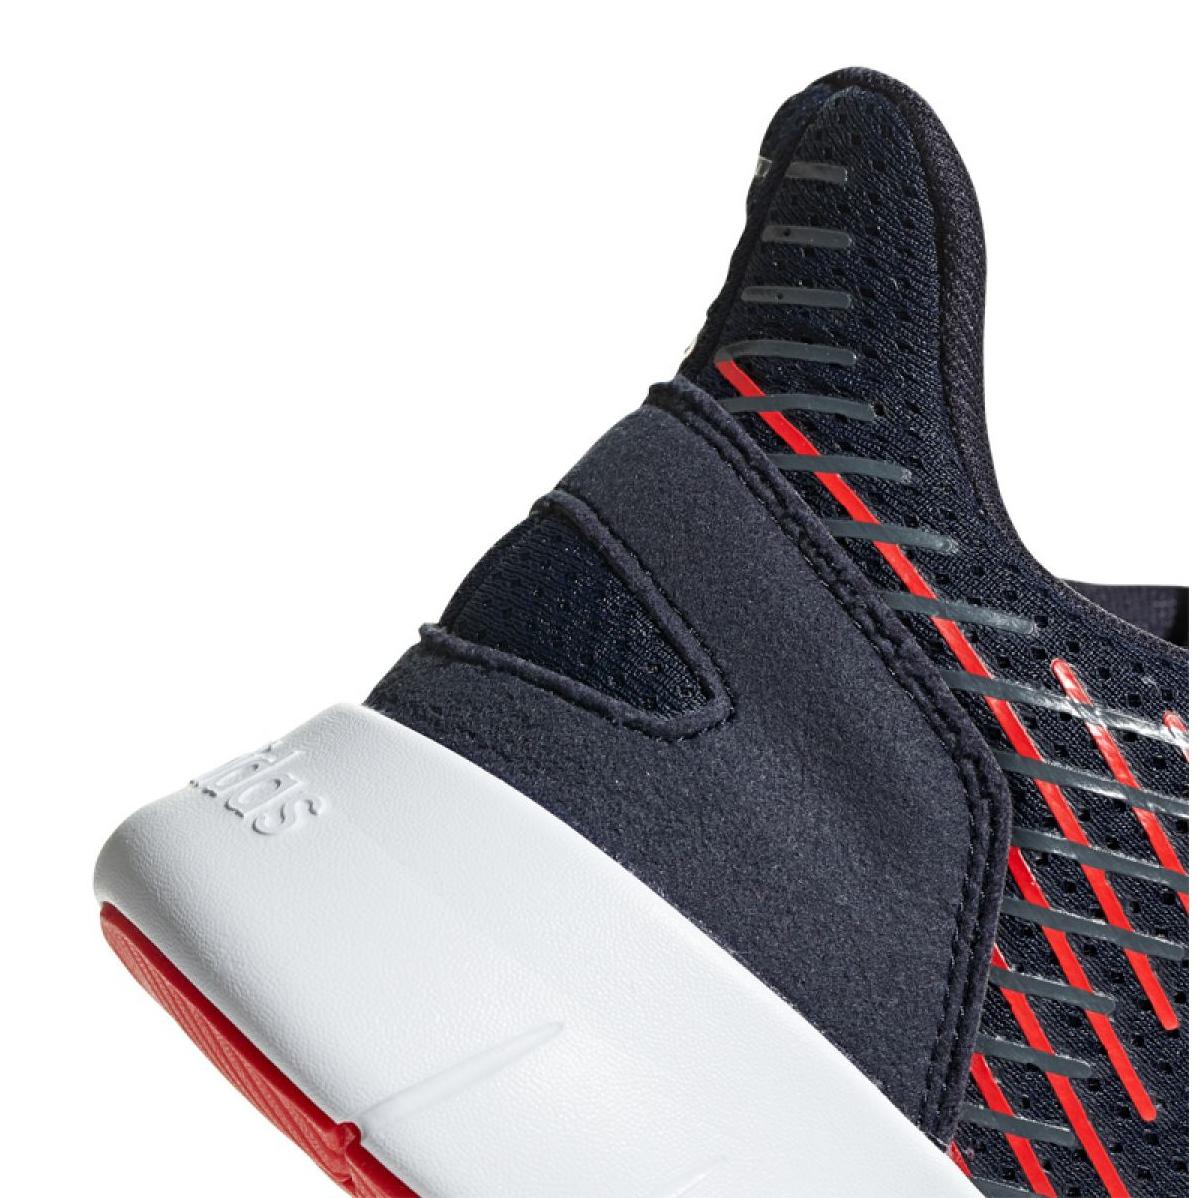 Billig Adidas Asweerun Herr Blå Löparskor F36334 Online